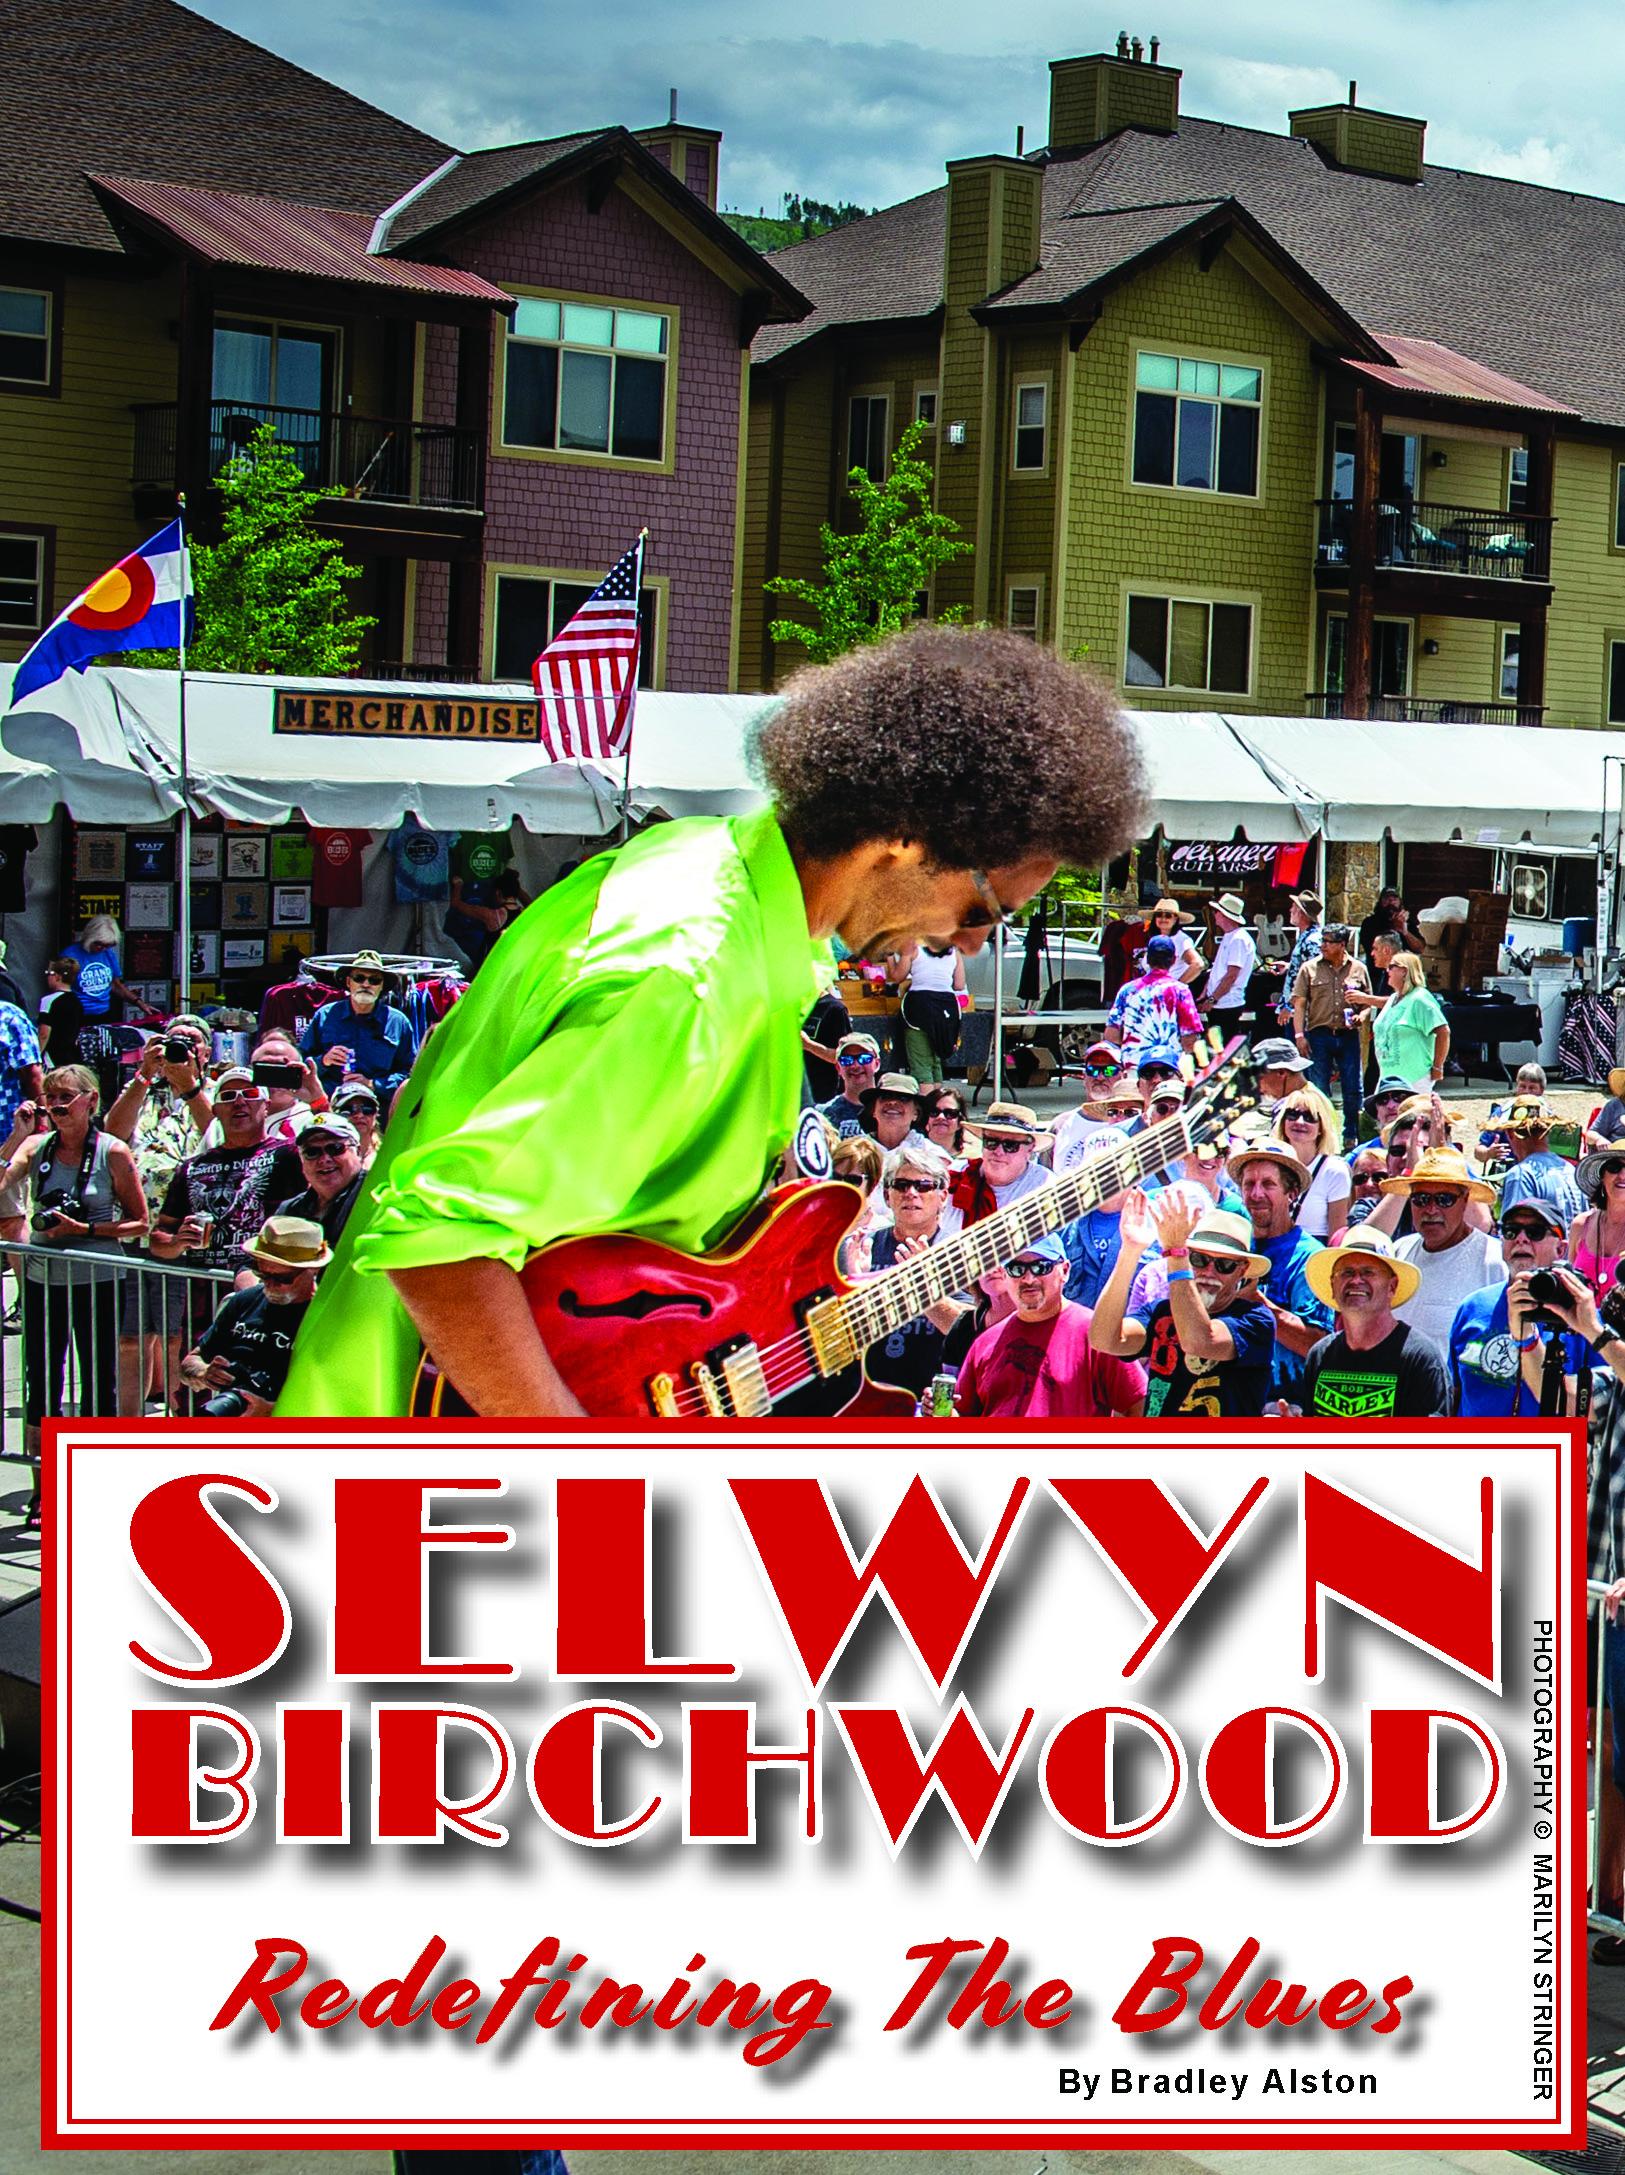 bmo-jan-15-2021-selwyn-birchwood6.jpg